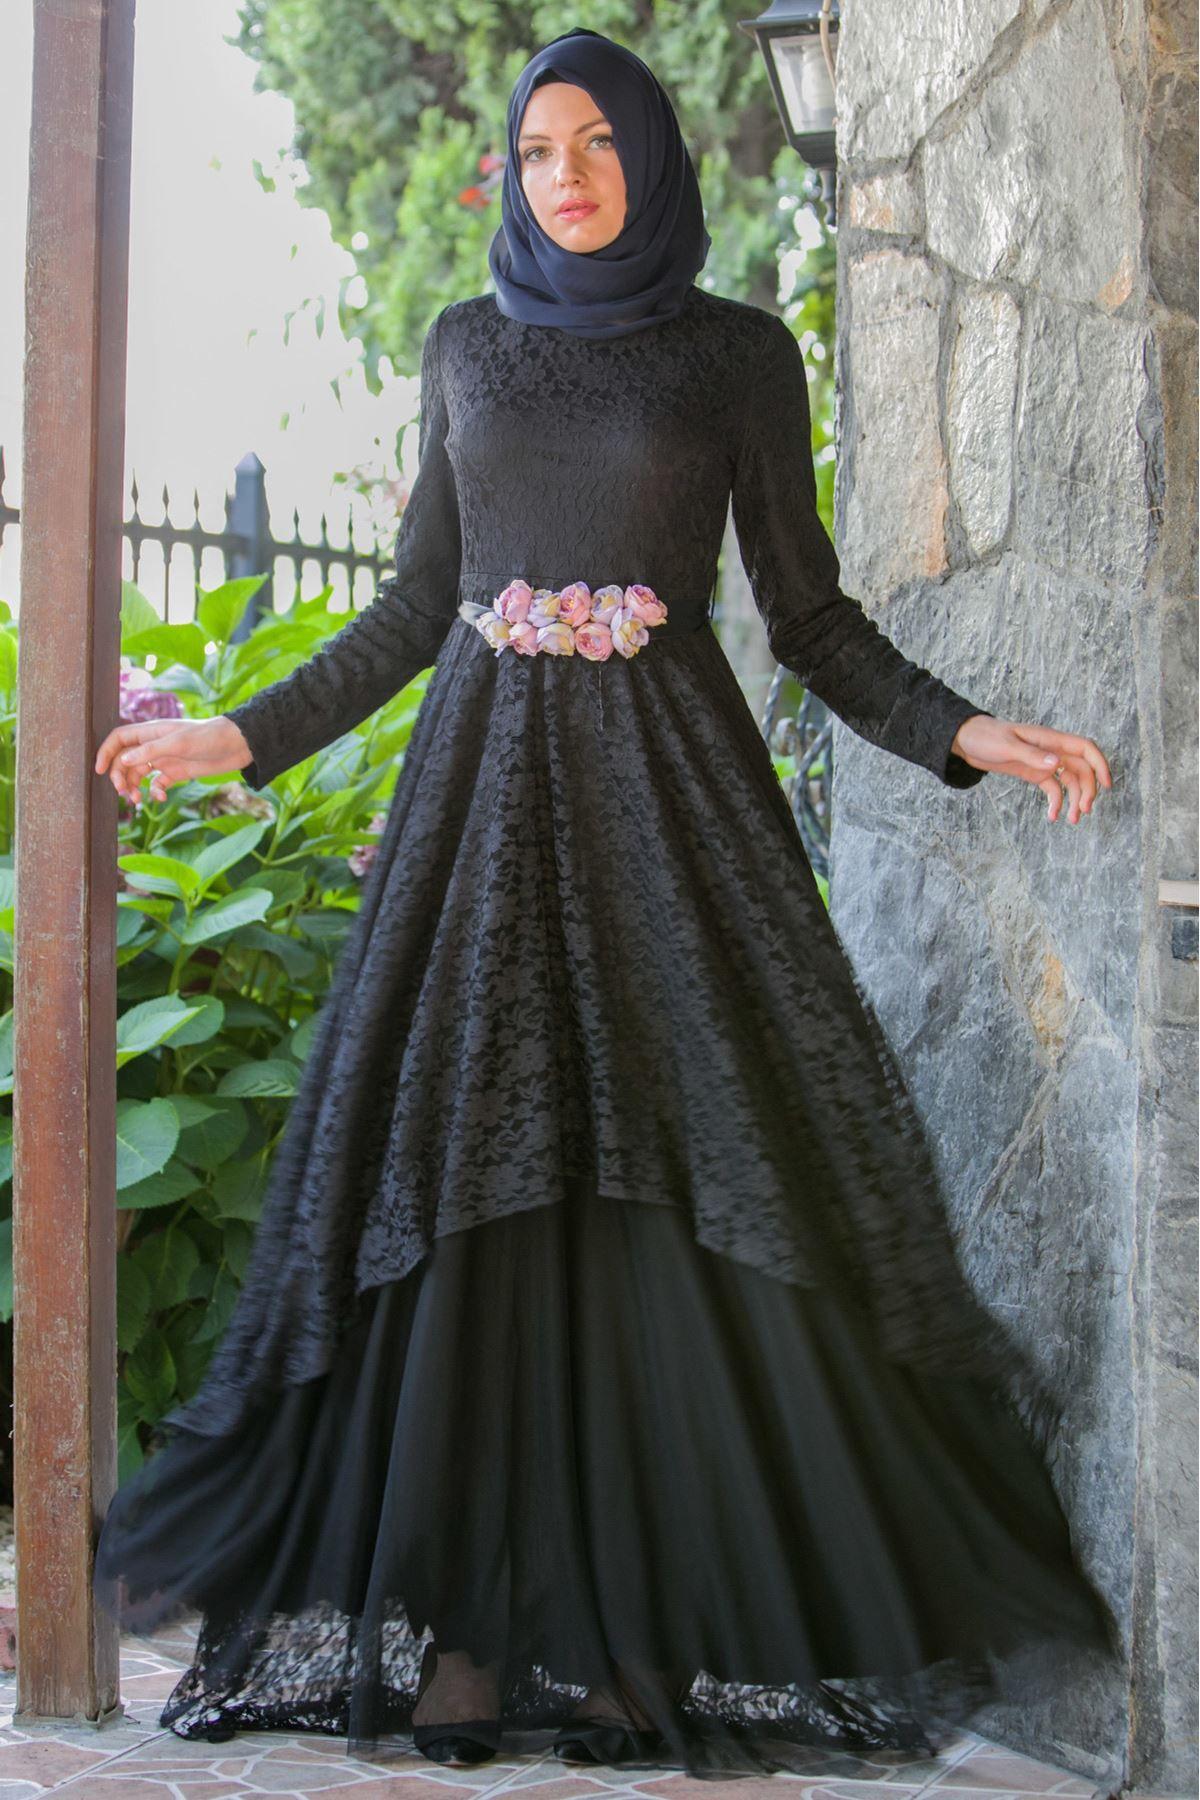 En Sik Patirti Com Tesettur Abiye Elbise Modelleri Https Www Tesetturelbisesi Com En Sik Patirti Com Tesettur Abiye Elbise Modelle Ball Gowns Fashion Gowns